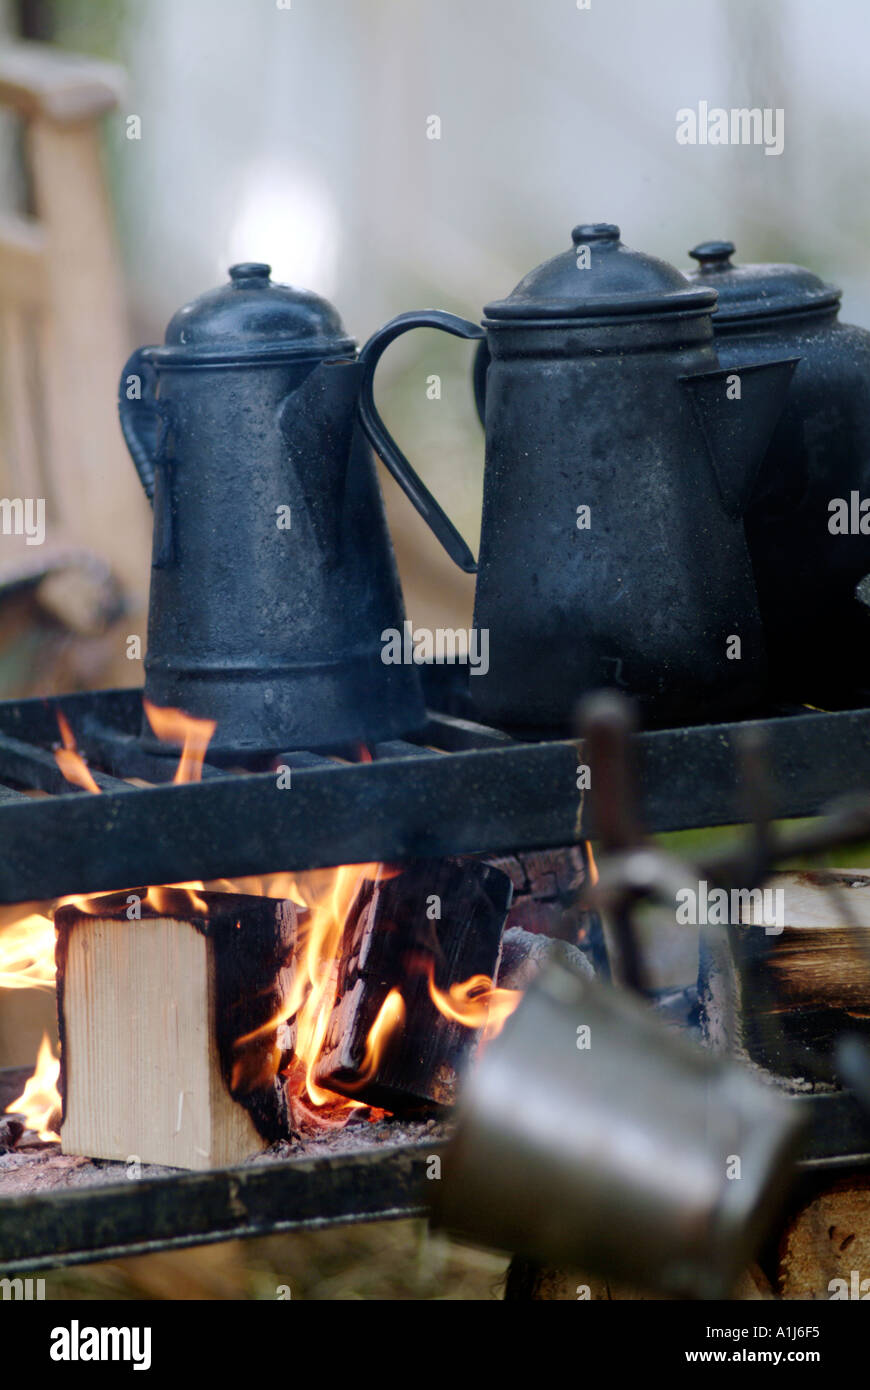 Cowboy Coffee Stock Photos & Cowboy Coffee Stock Images - Alamy